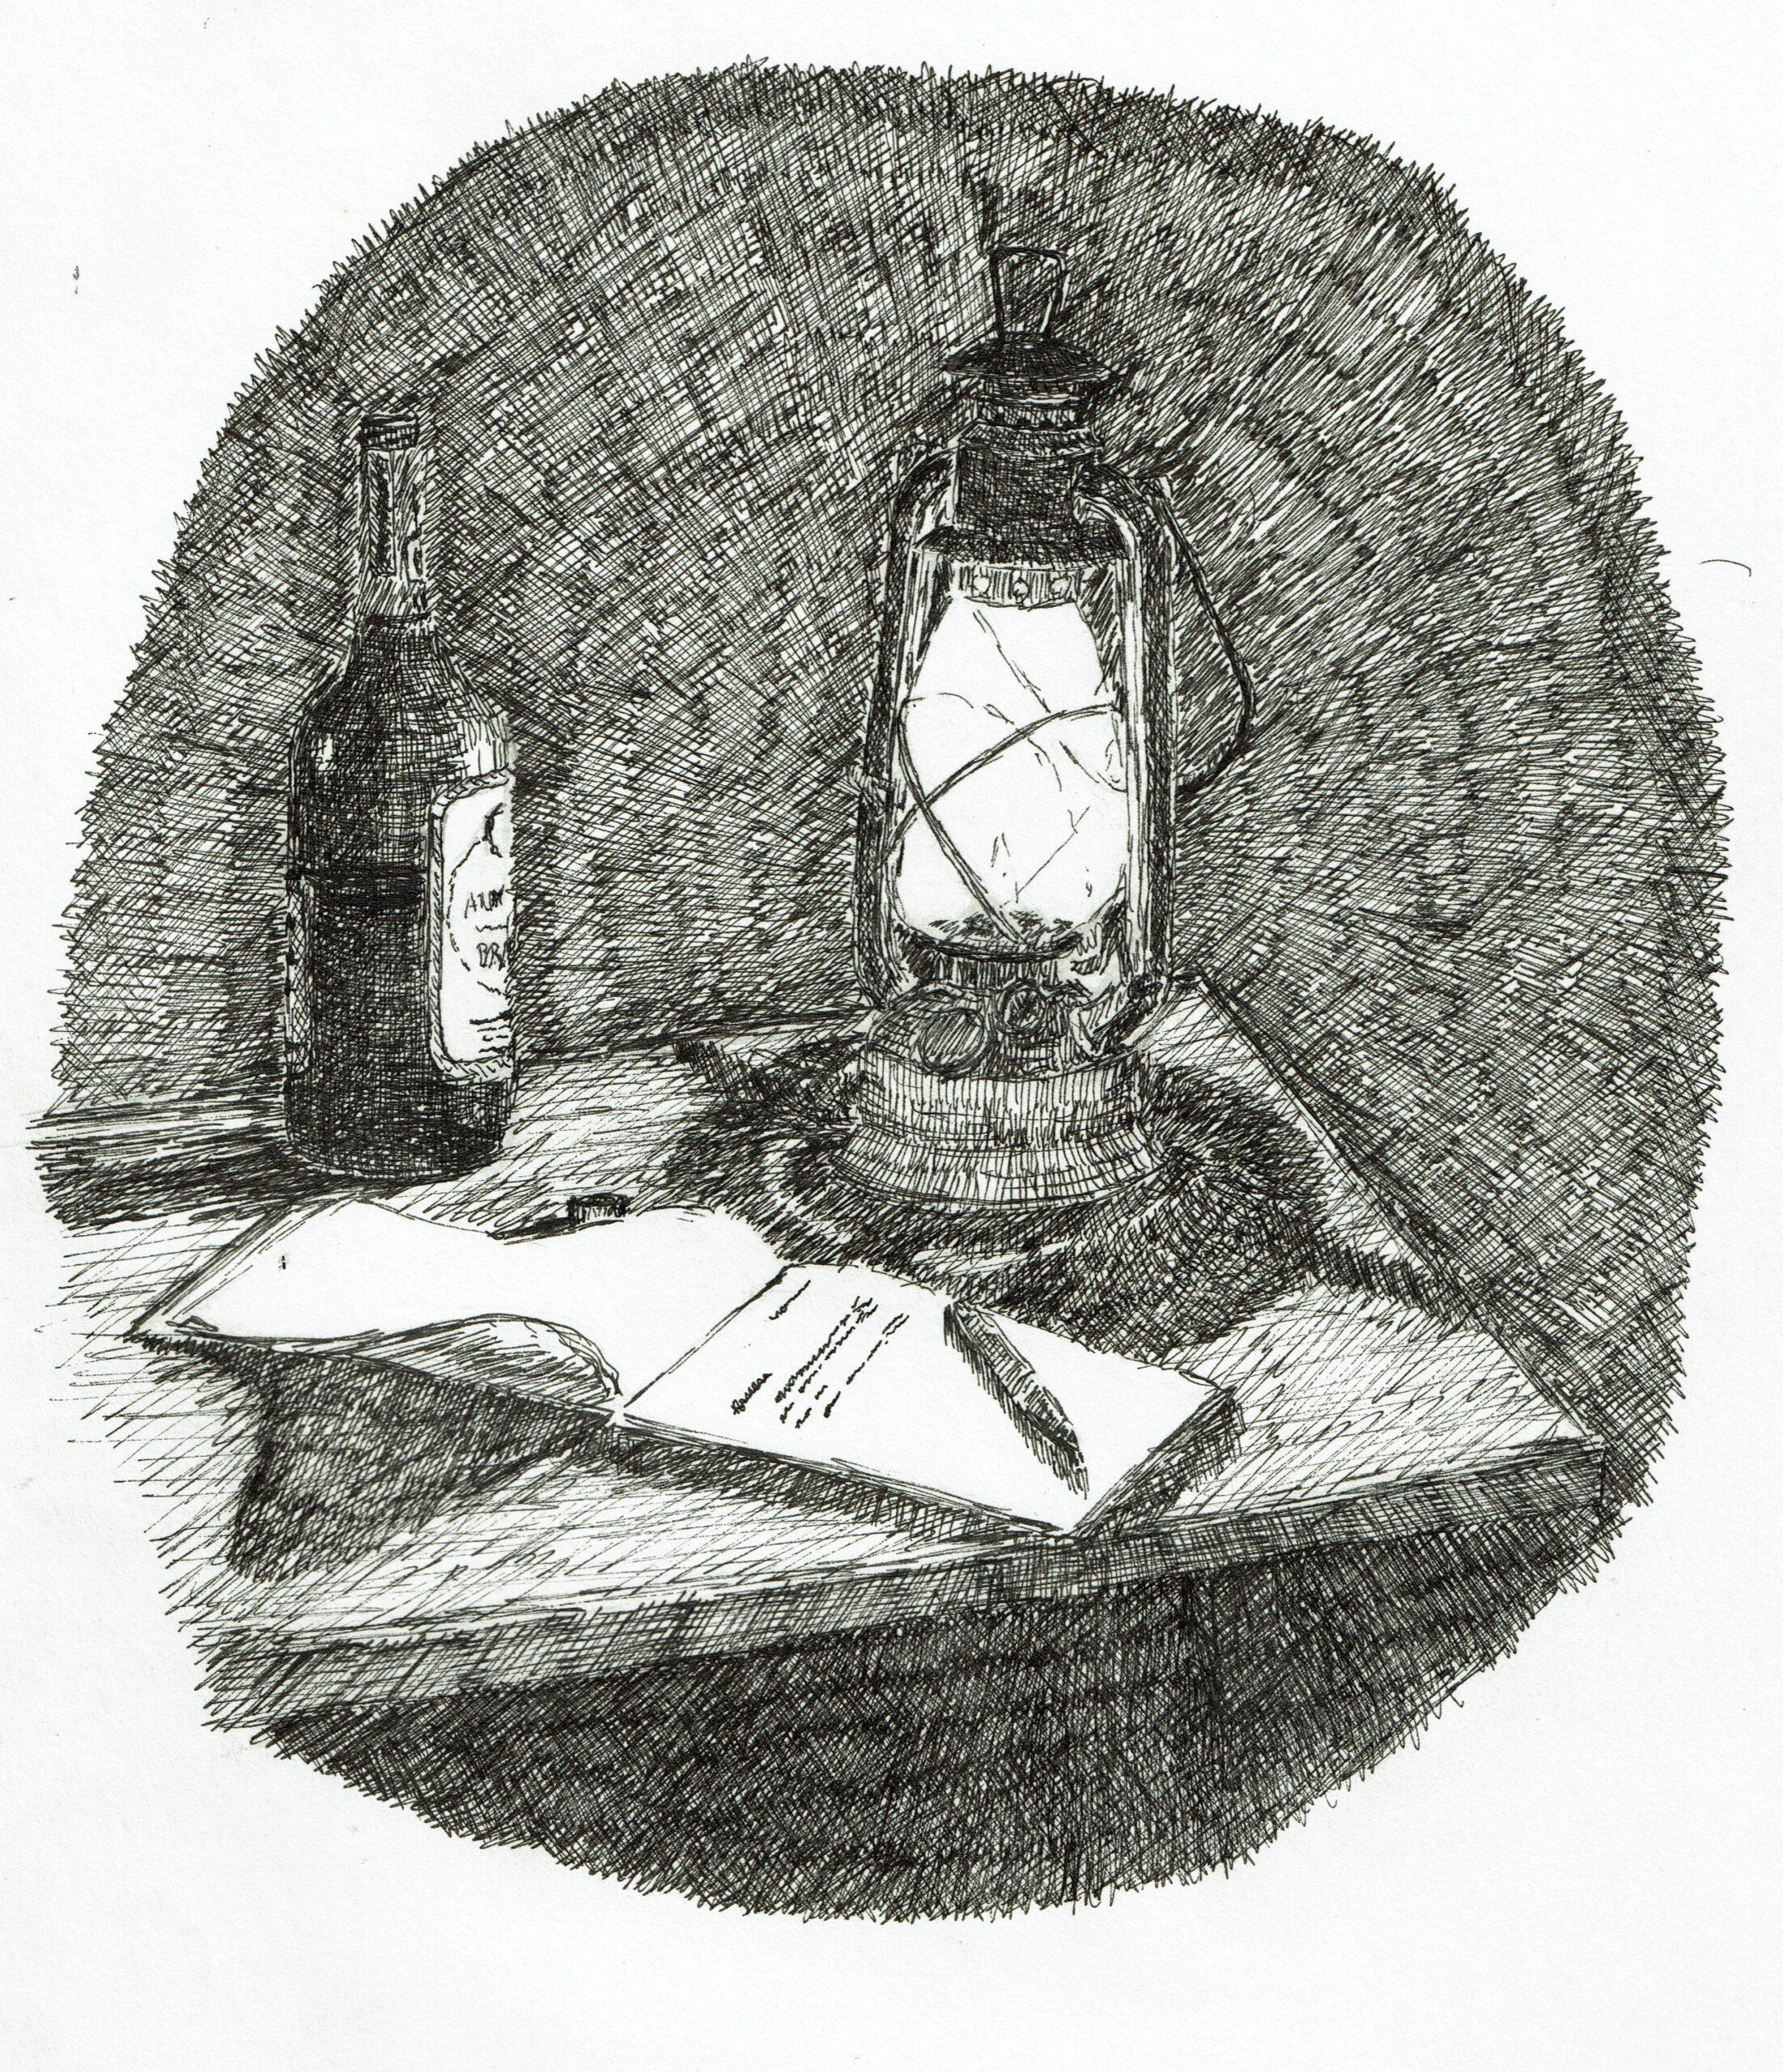 Buyck log cabin, ink drawing, tablet and lanturn